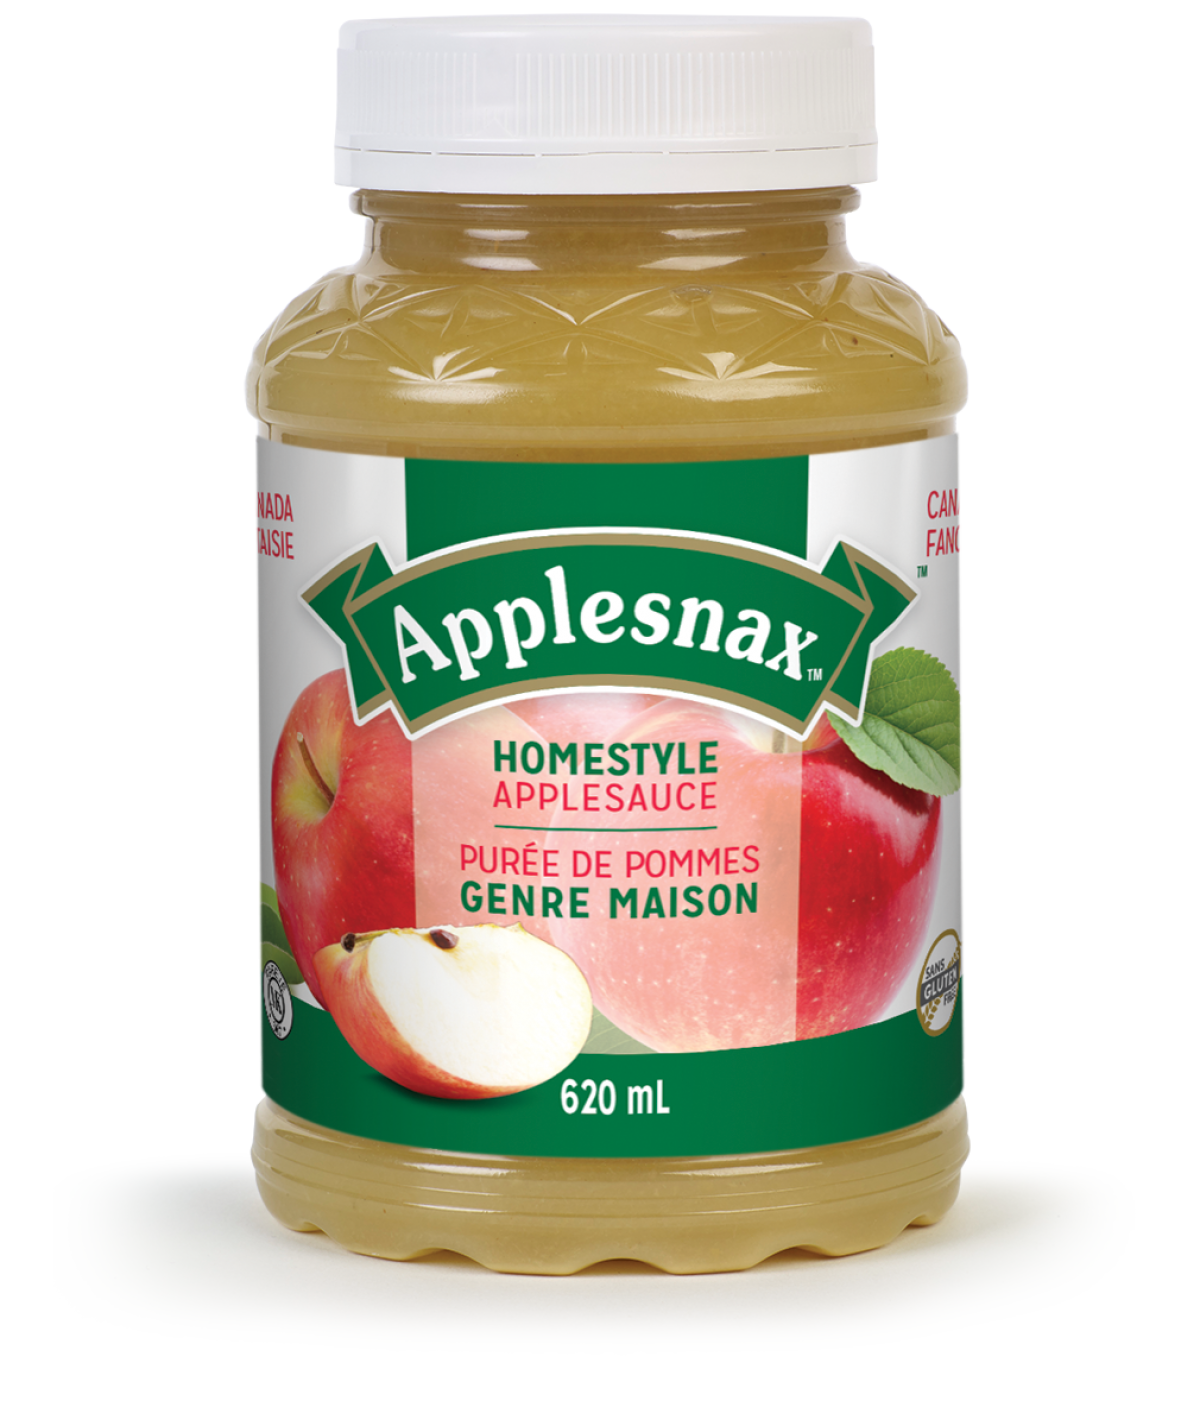 Applesnax Homestyle Applesauce Jar